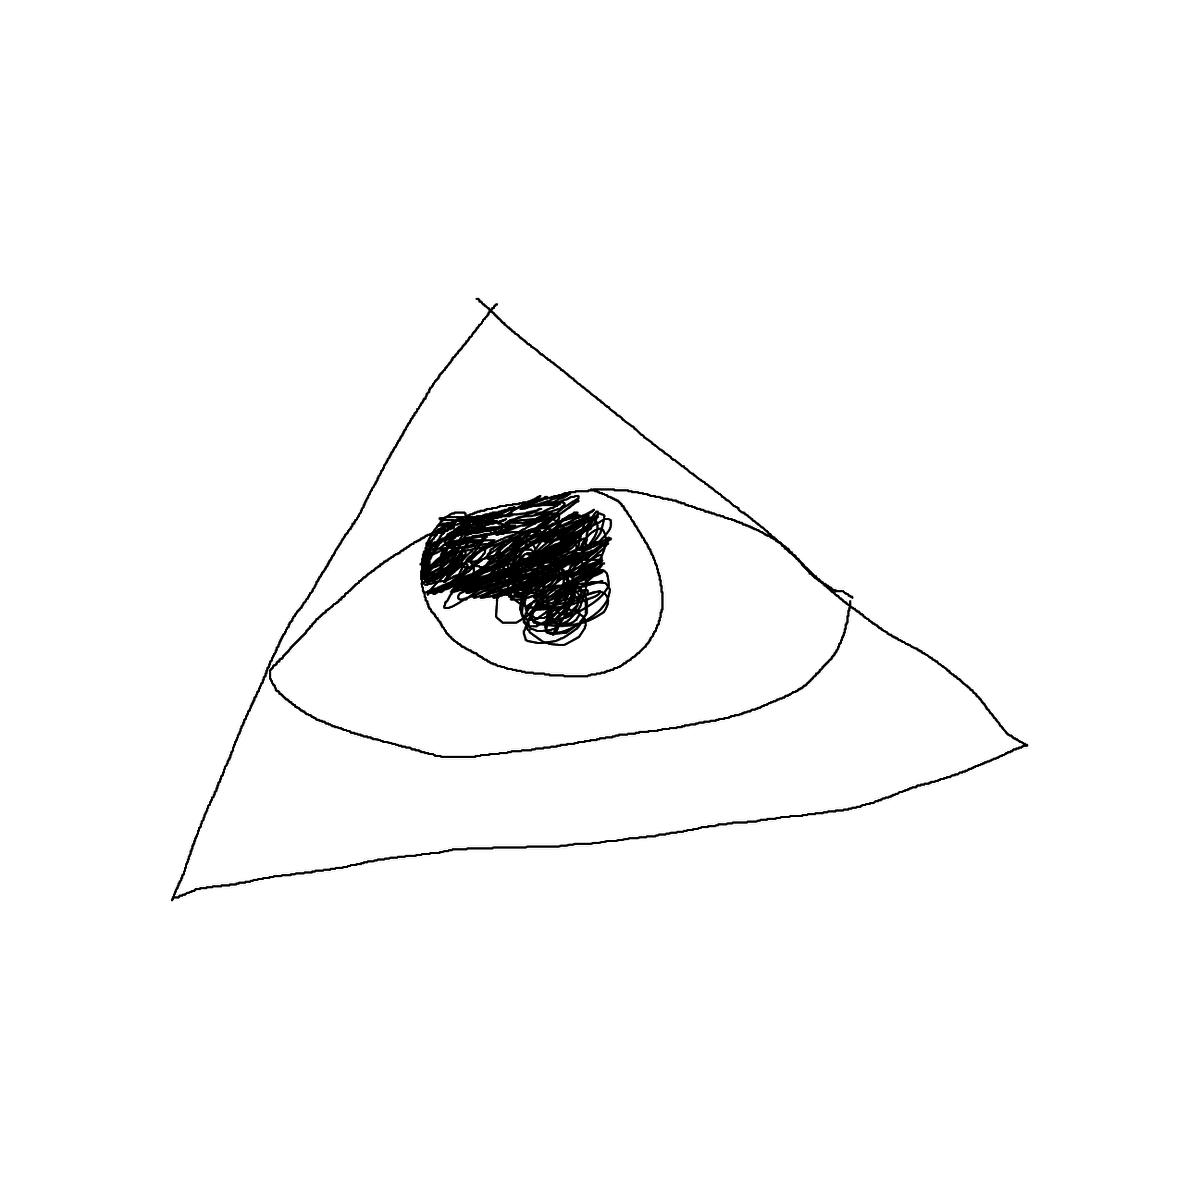 BAAAM drawing#11145 lat:-32.5336532592773440lng: 152.3000488281250000